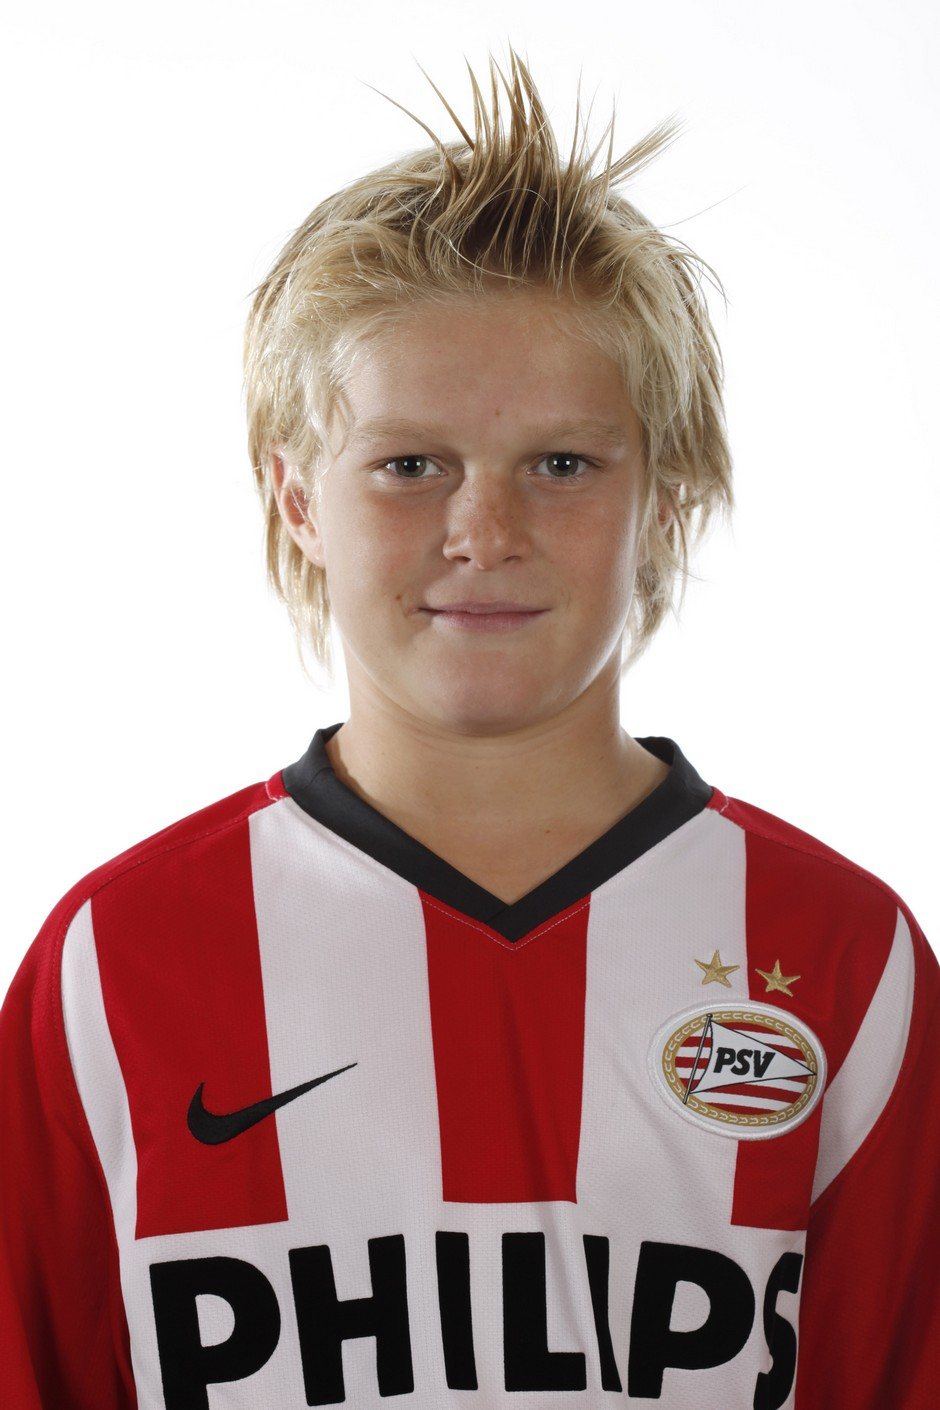 PSV D2 - 2009-2010